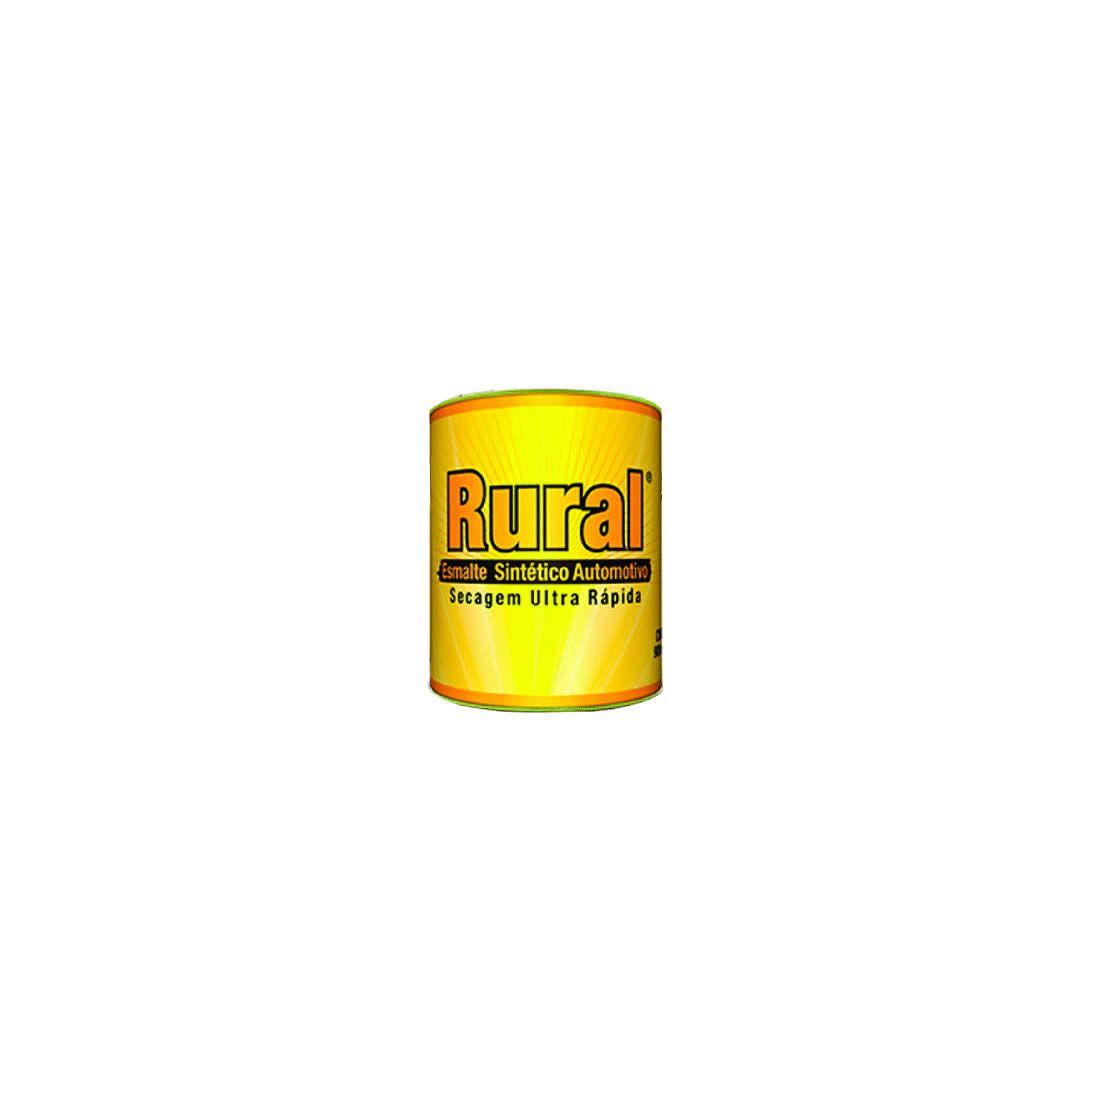 Esmalte Sintético Rural Secagem Ultra Rápido Amarelo Caterpillar 6102 900ml